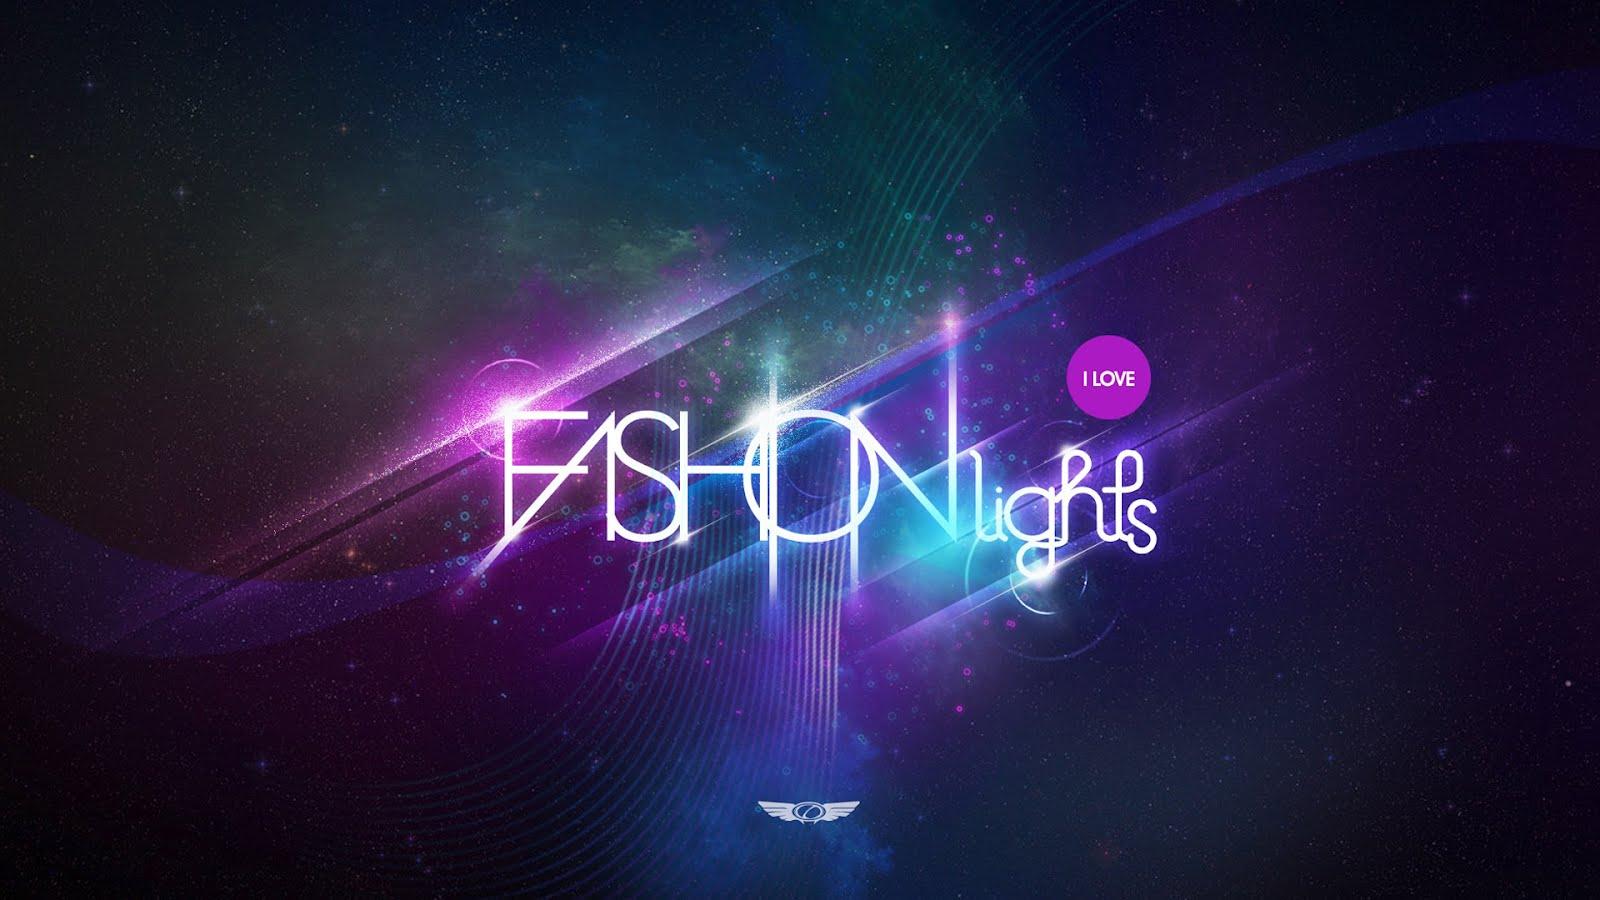 WebsiteTemplates.bz Blog: Beautiful Fashion Wallpapers